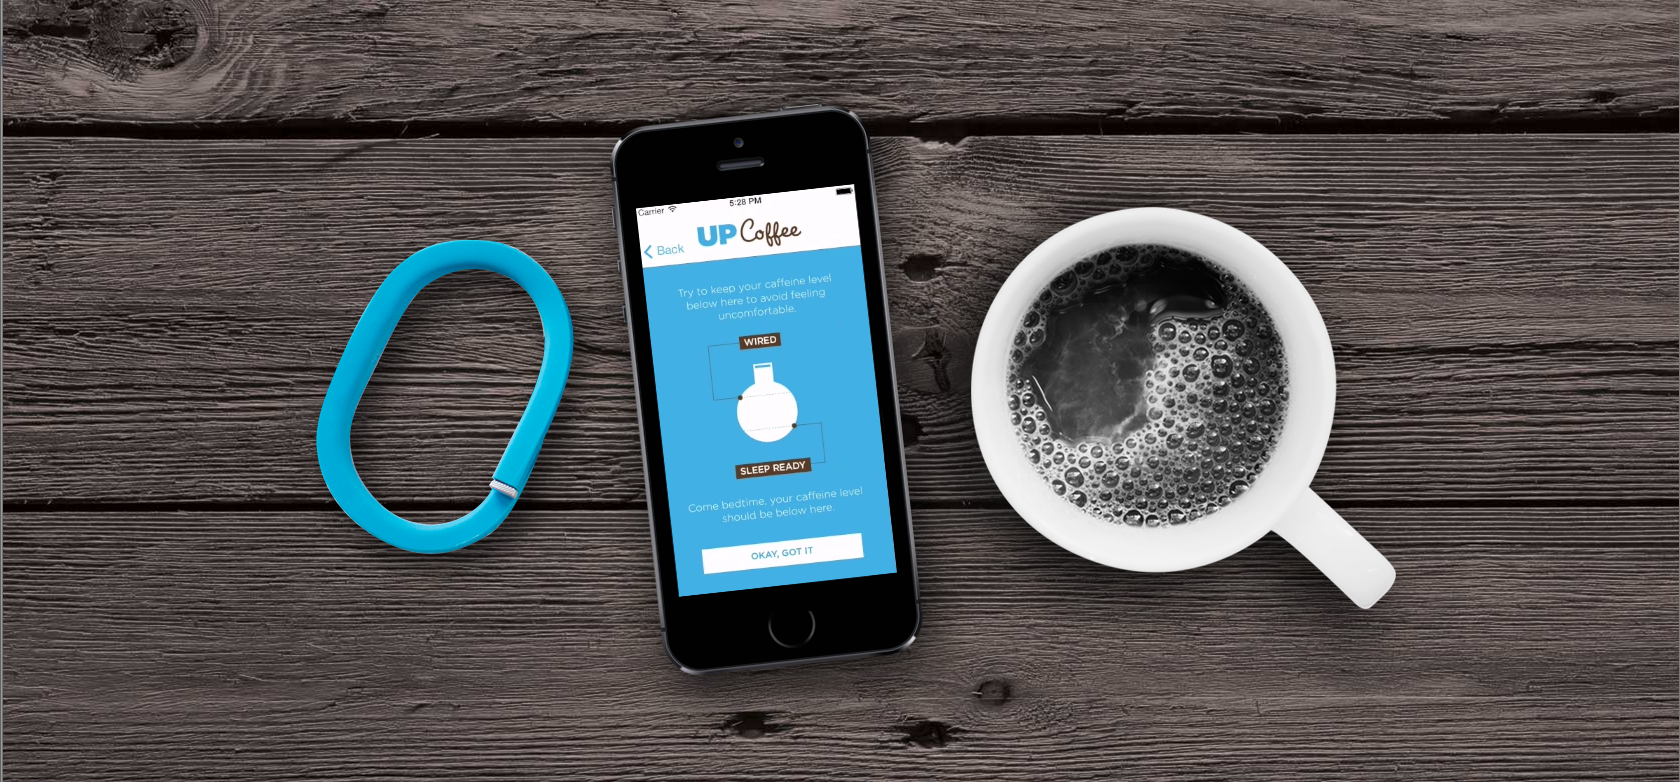 Up Coffee – Track Your Caffeine [Video] | Apple iPhone School